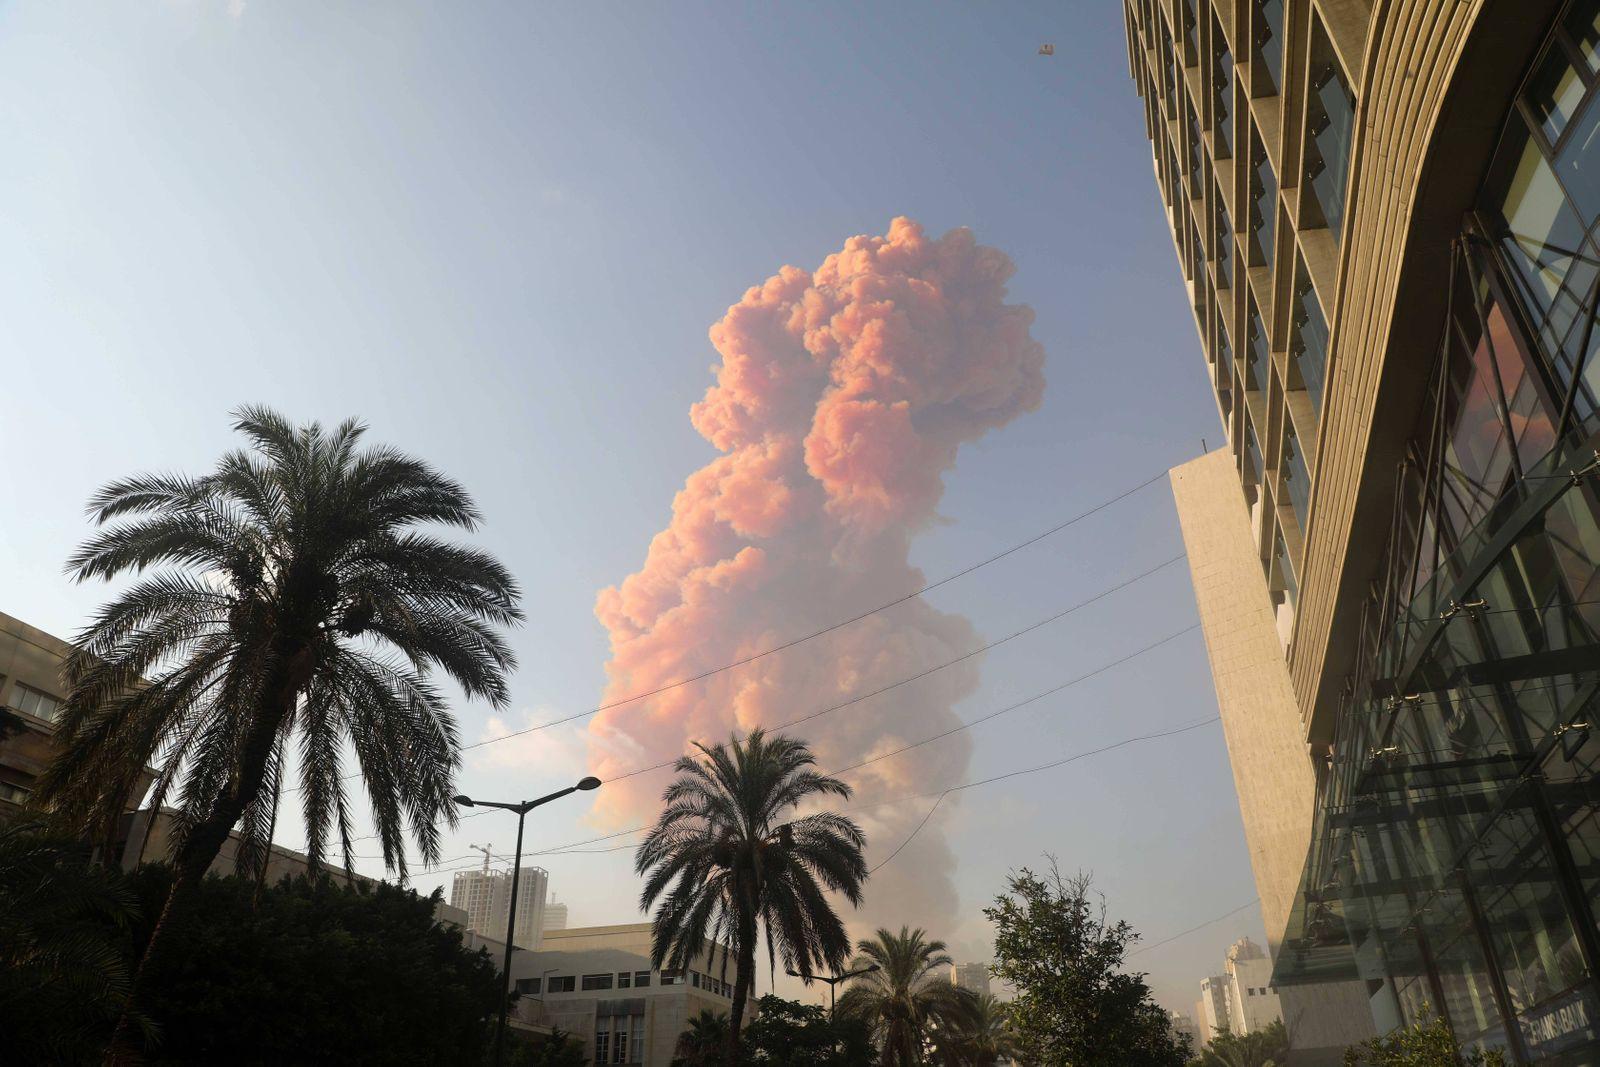 (200804) -- BEIRUT, Aug. 4, 2020 (Xinhua) -- Pink smoke rises following the explosion in Beirut, Lebanon, Aug. 4, 2020.